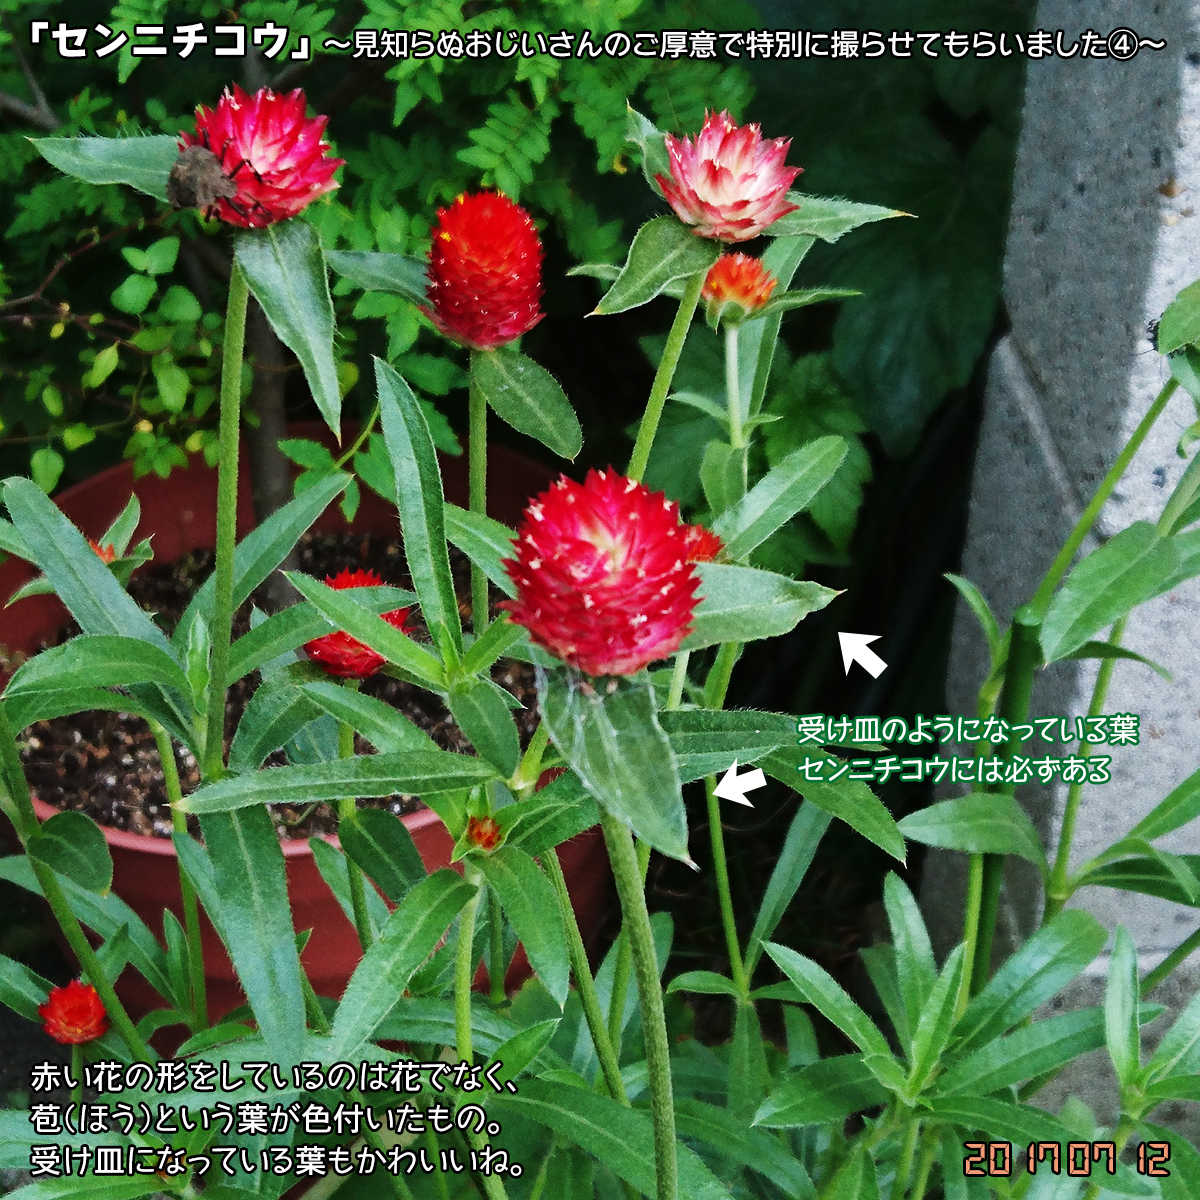 DSC_3132.jpg